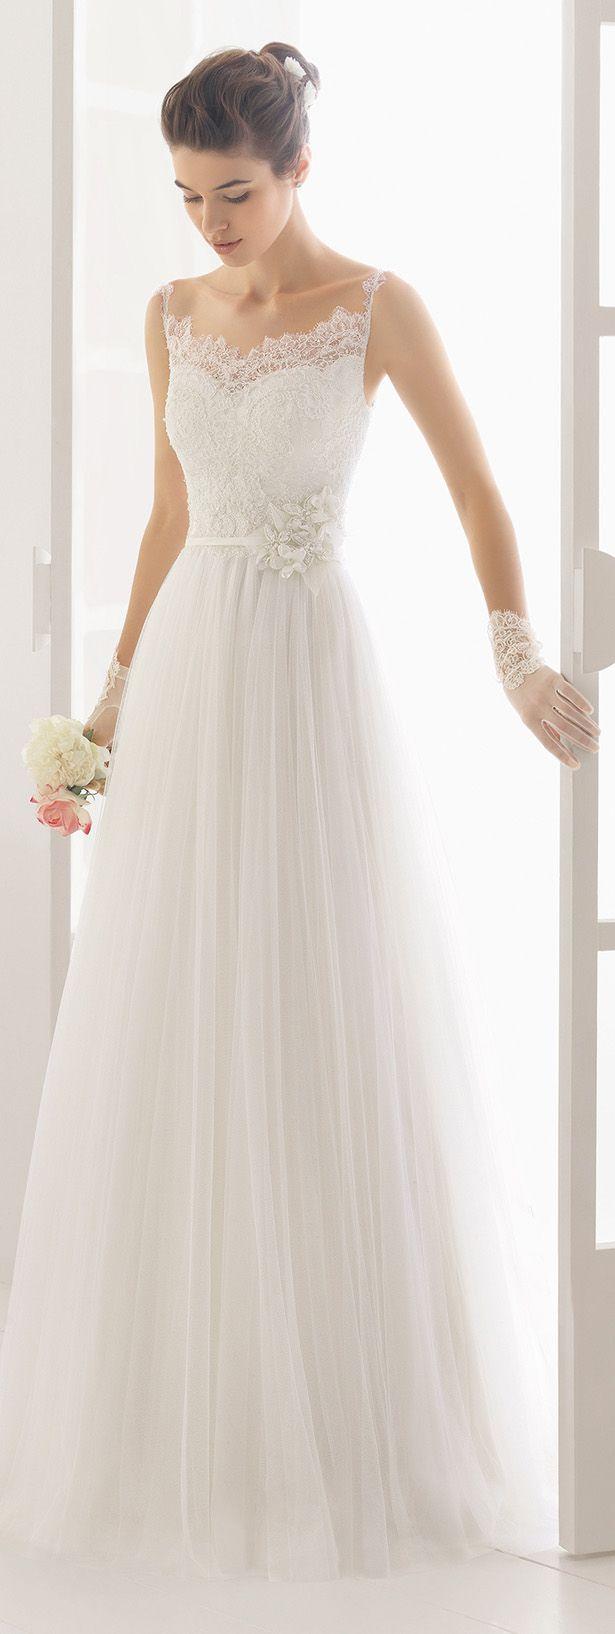 Modern vintage wedding dresses   best  WEDDING  images on Pinterest  Bridal gowns Gown